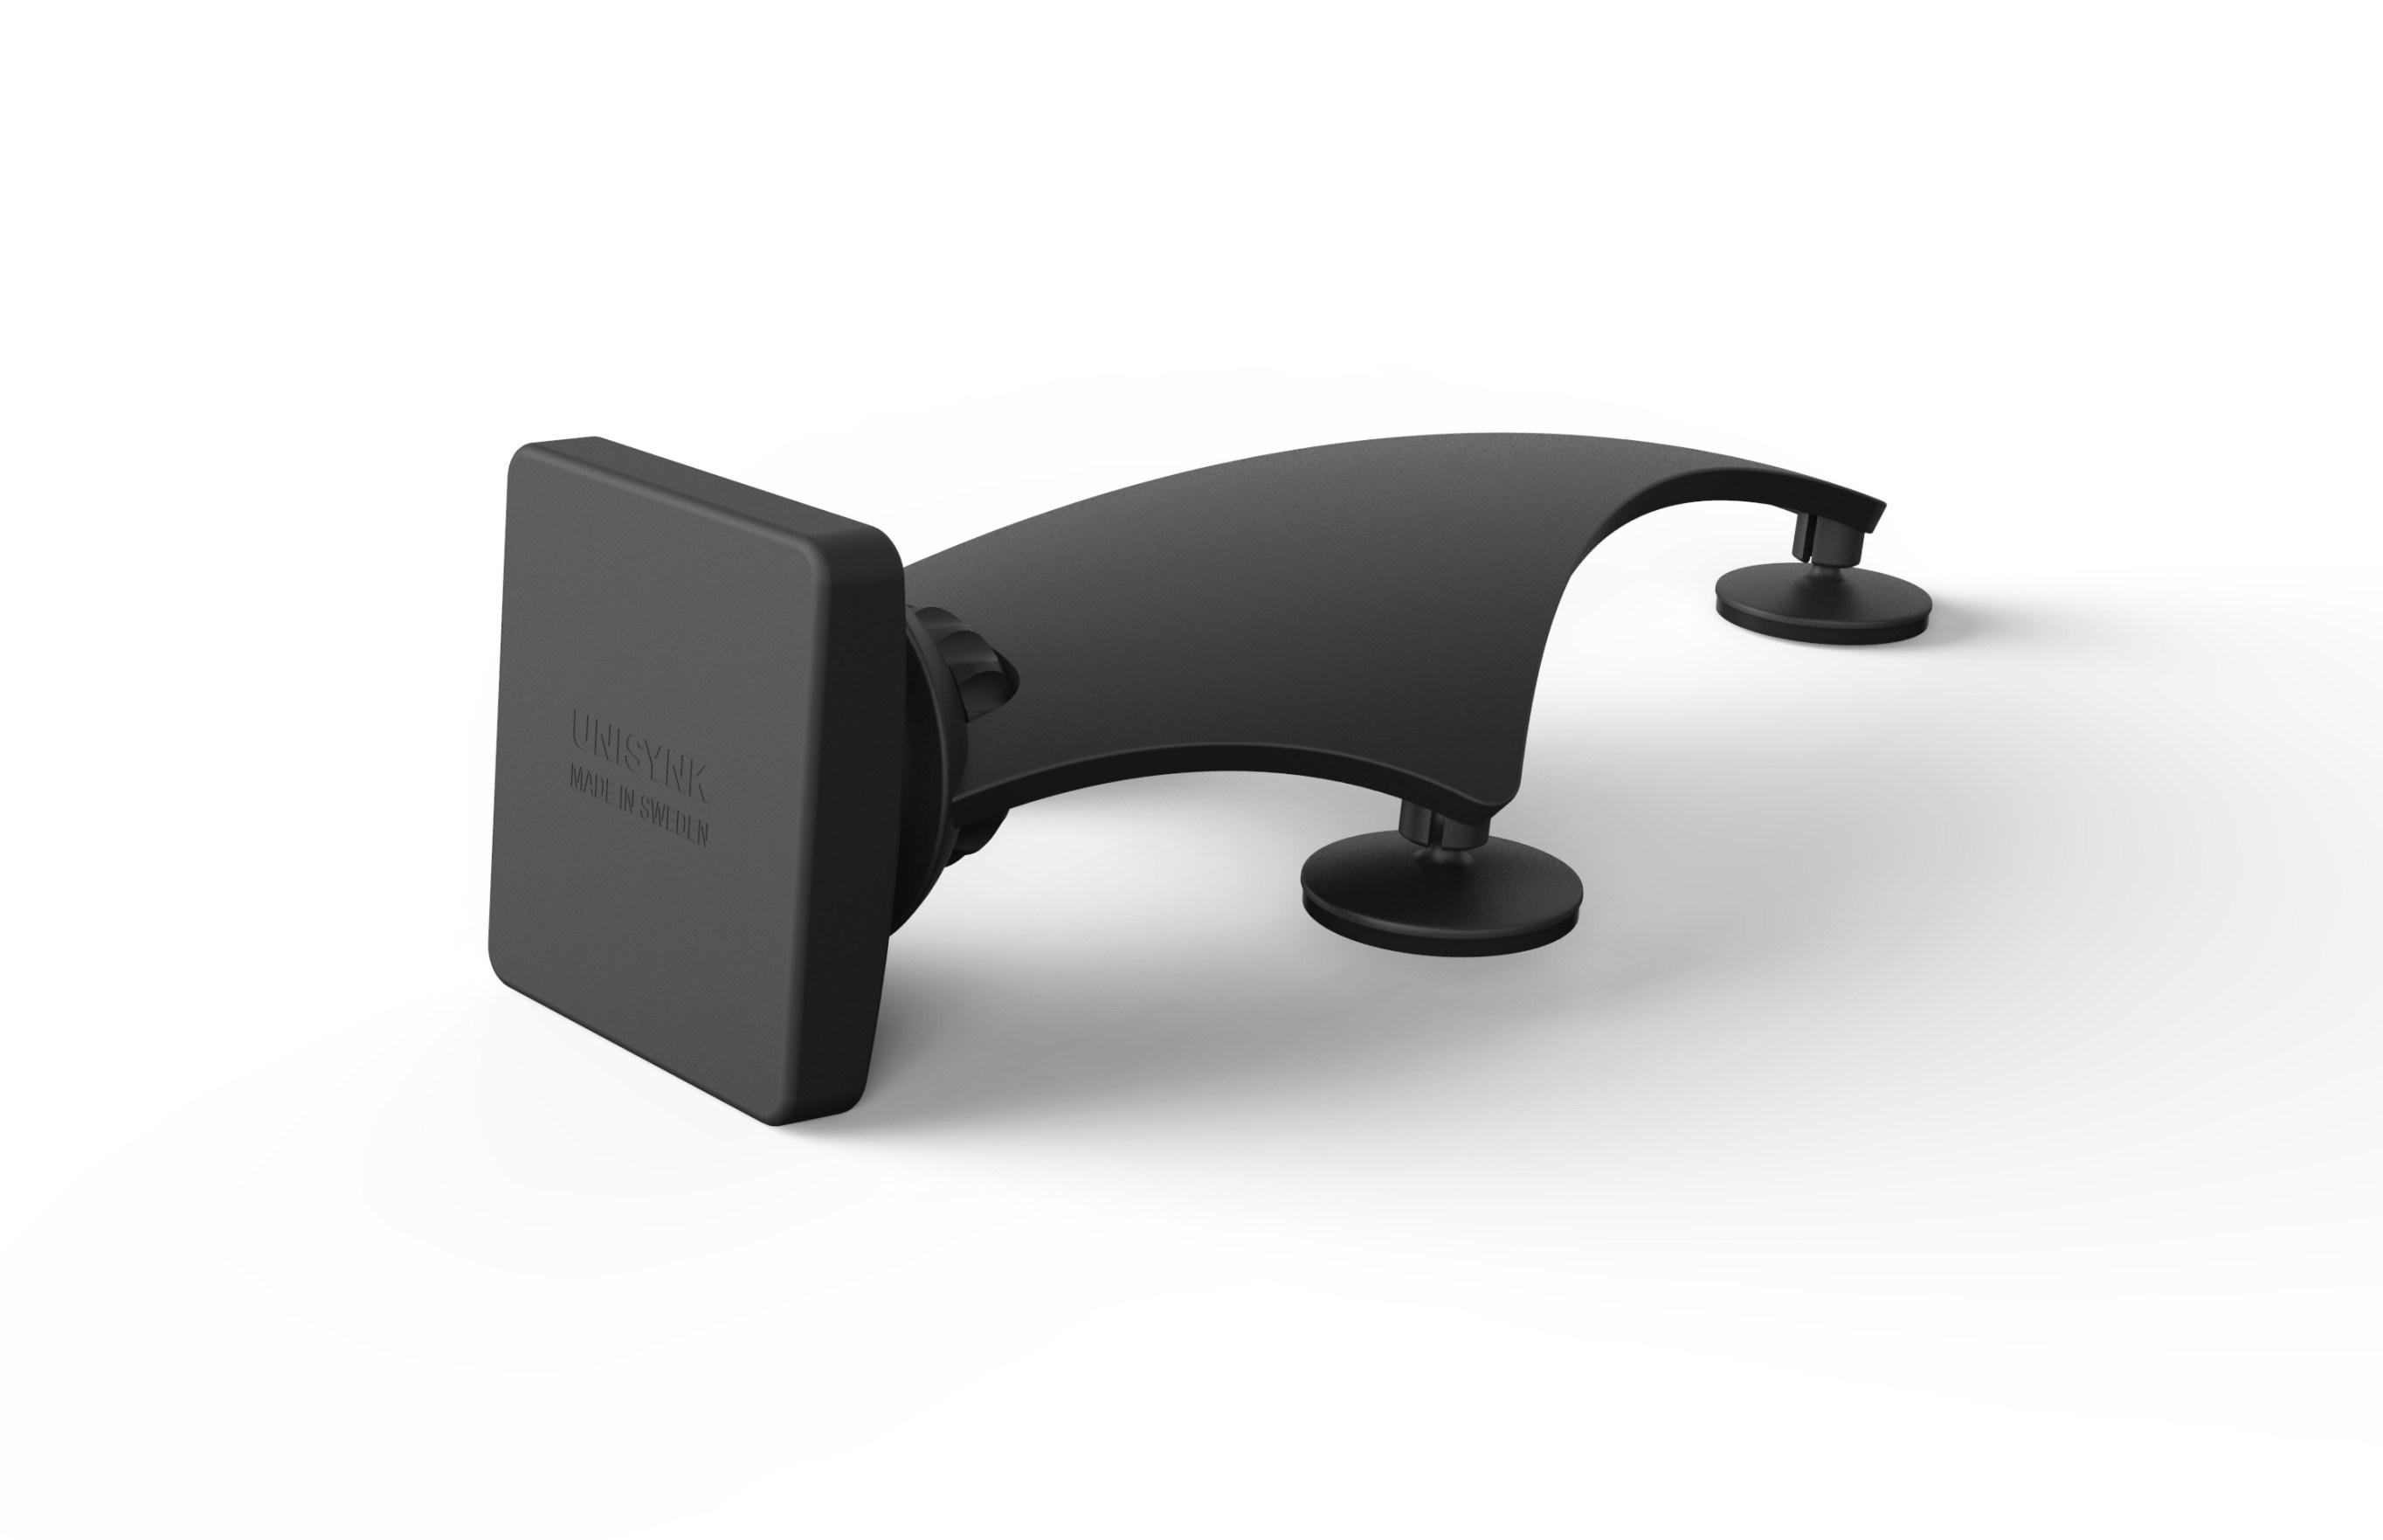 Puhelintel magnet kojetauluun